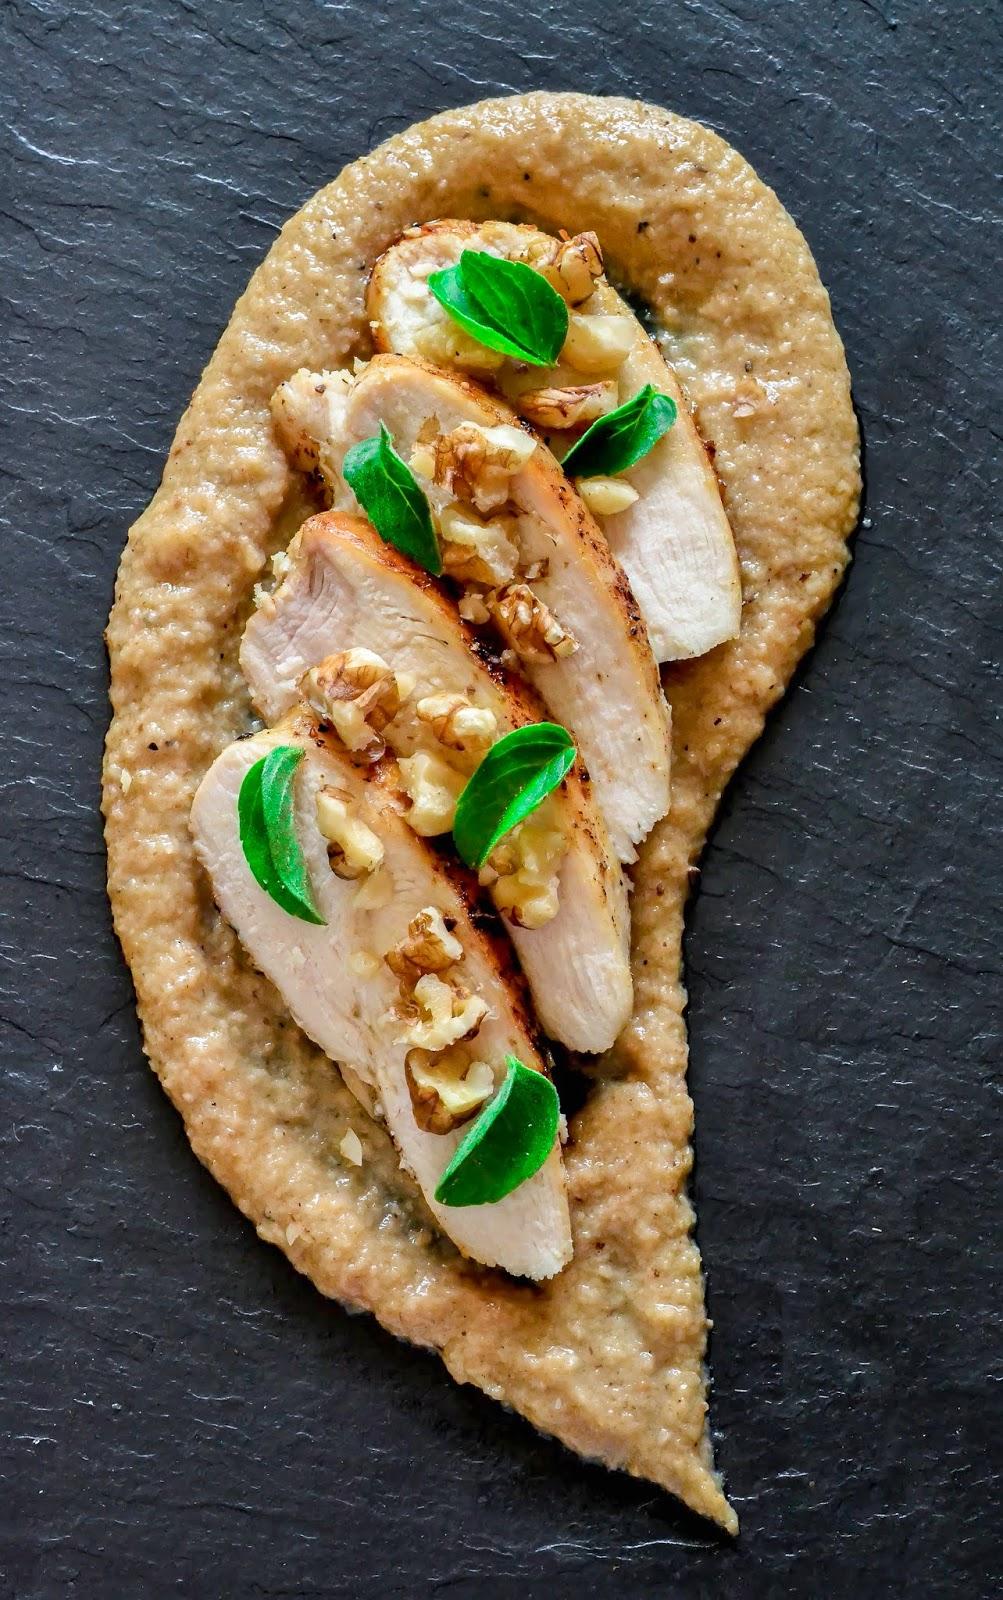 Sara S Kitchen Chicken Sharkaseya شركسية الدجاج